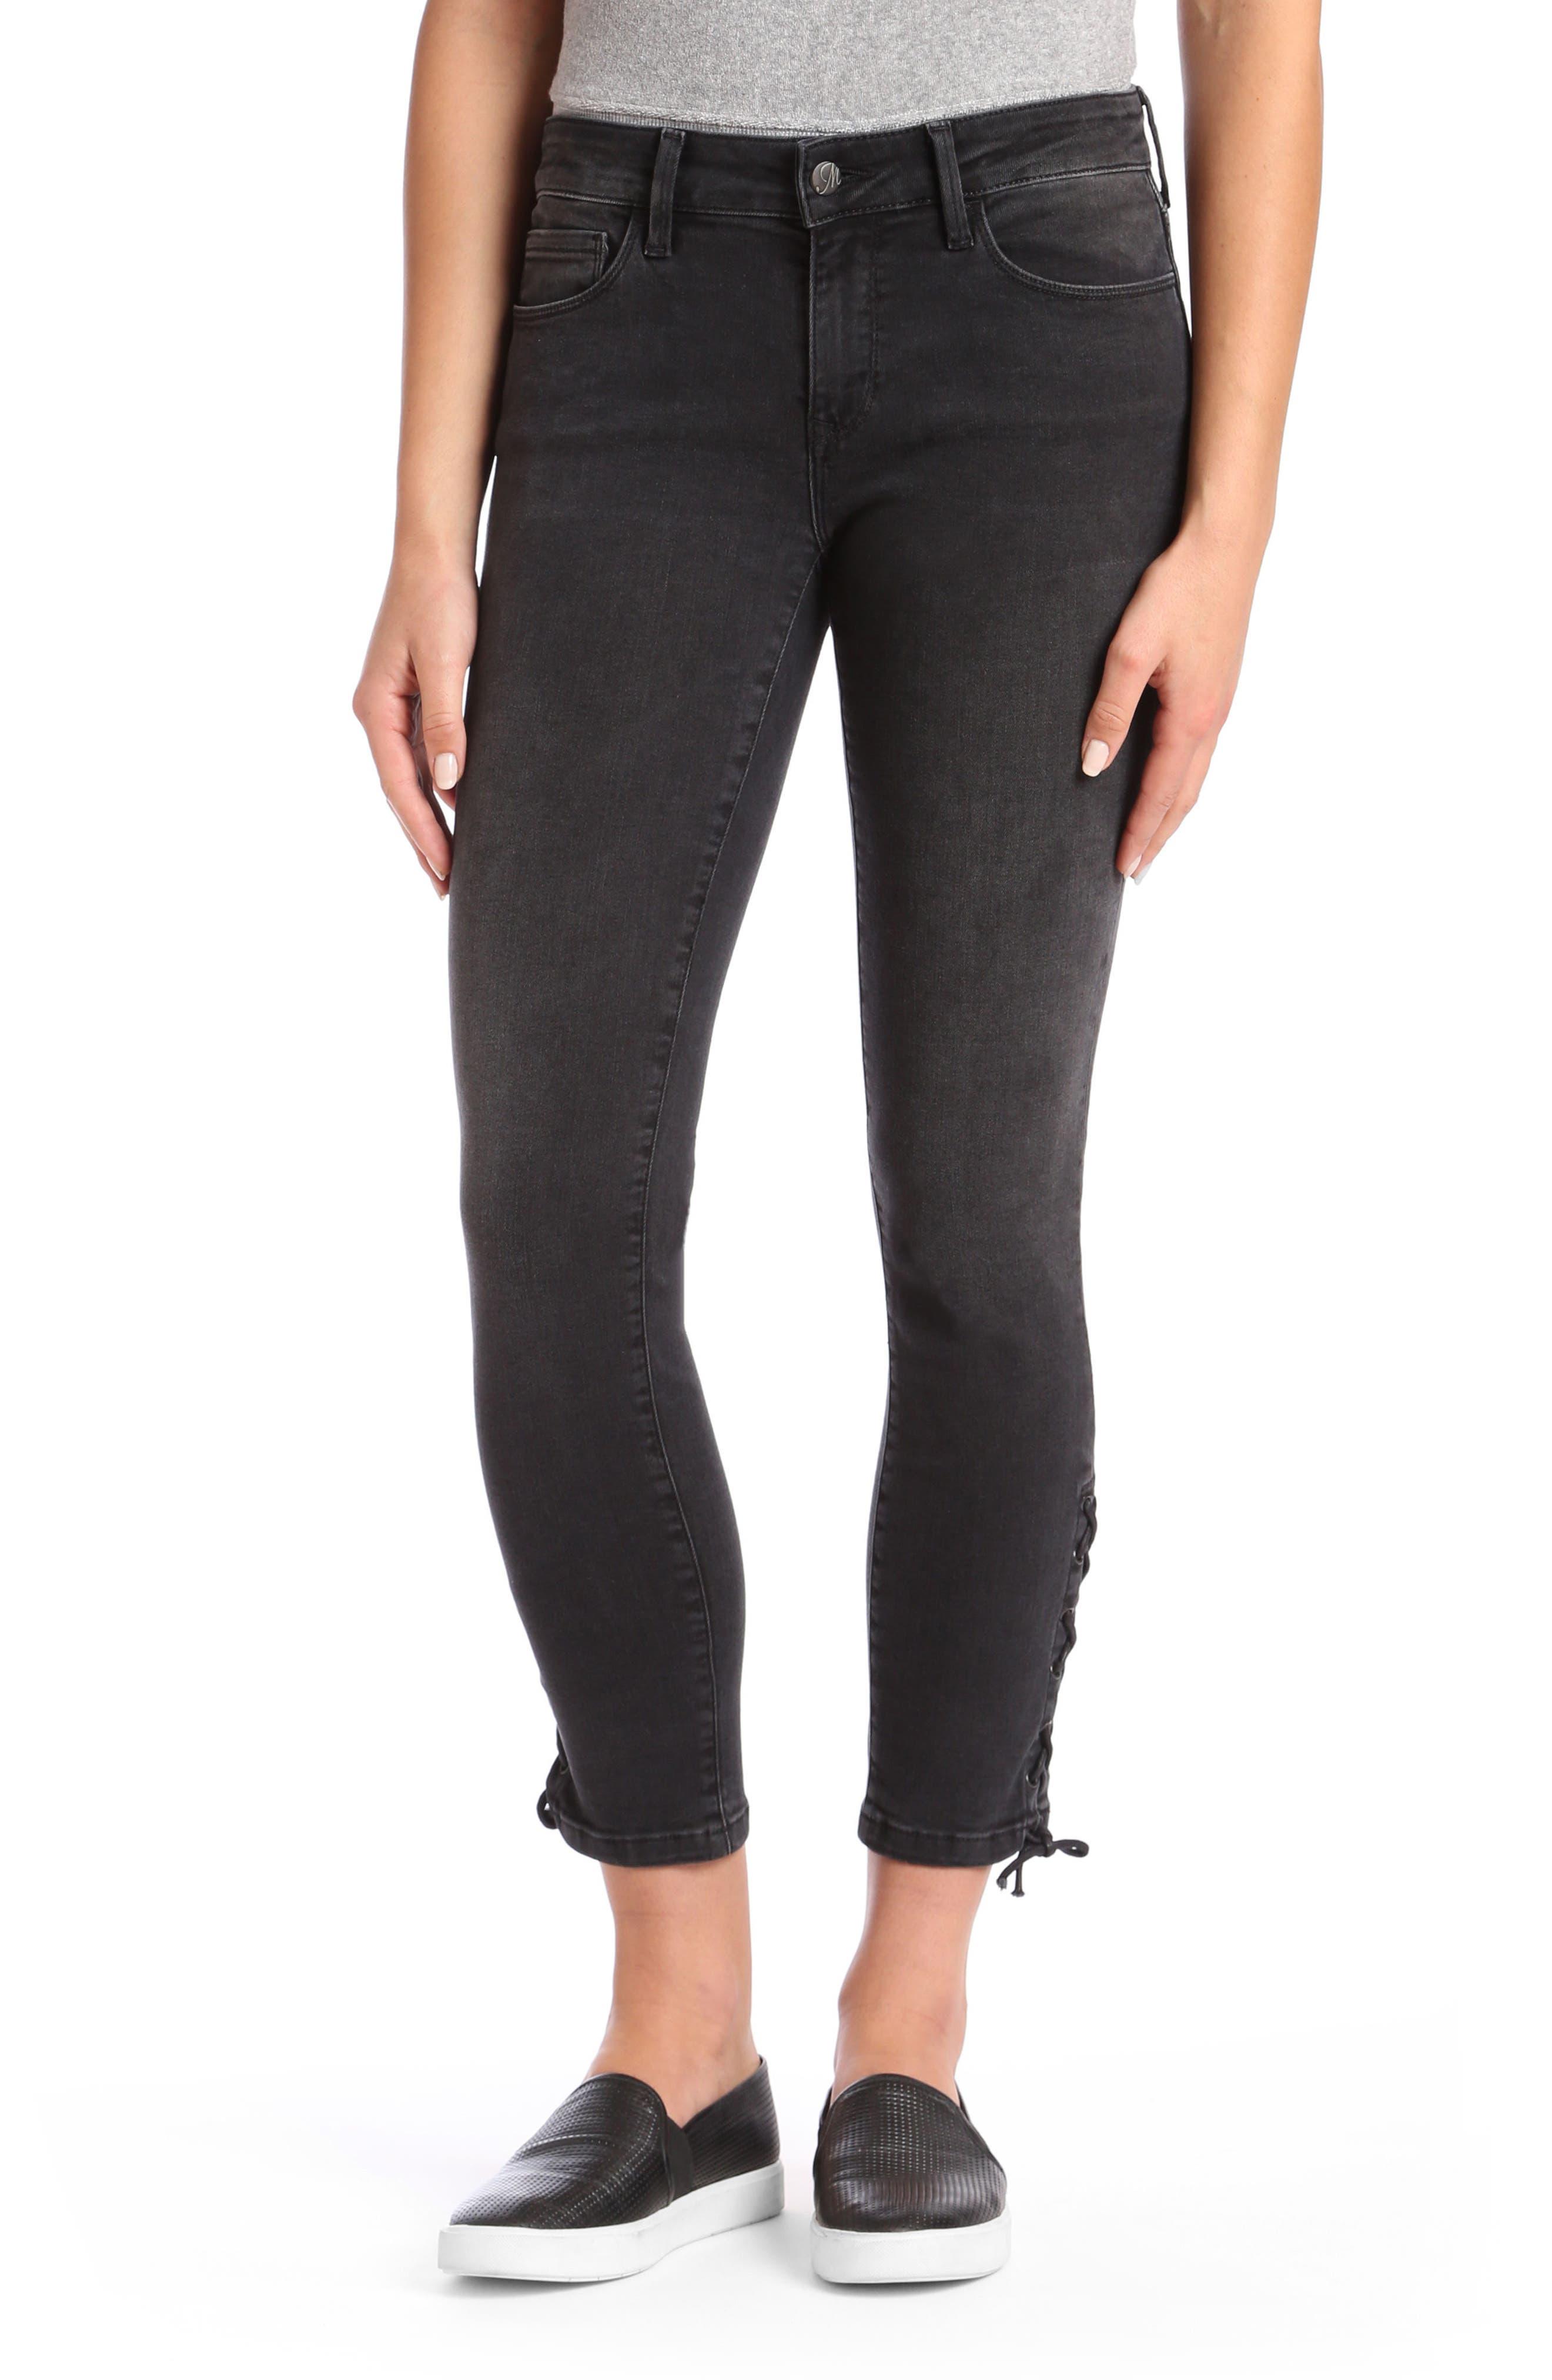 Main Image - Mavi Adriana Lace Up Ankle Super Skinny Jeans (Smoke Lace)